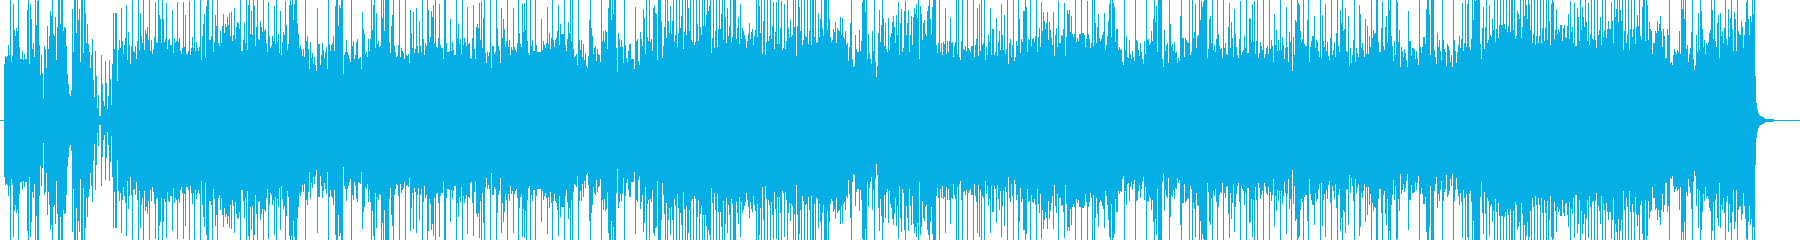 「HR/HM」「激しい」BGM43の再生済みの波形